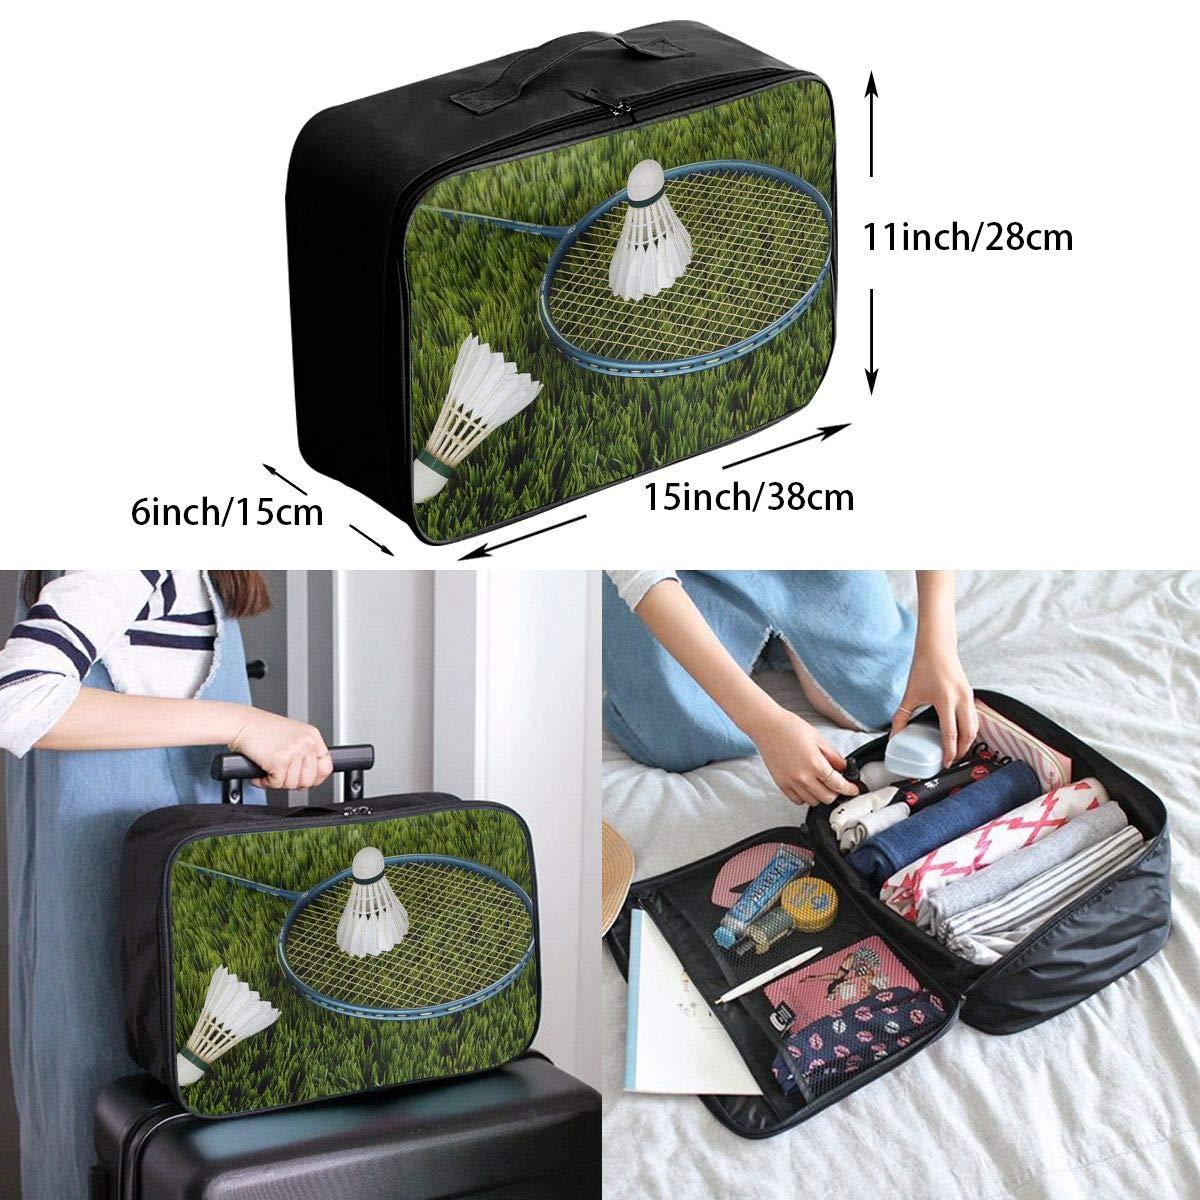 Travel Luggage Duffle Bag Lightweight Portable Handbag Badminton Large Capacity Waterproof Foldable Storage Tote